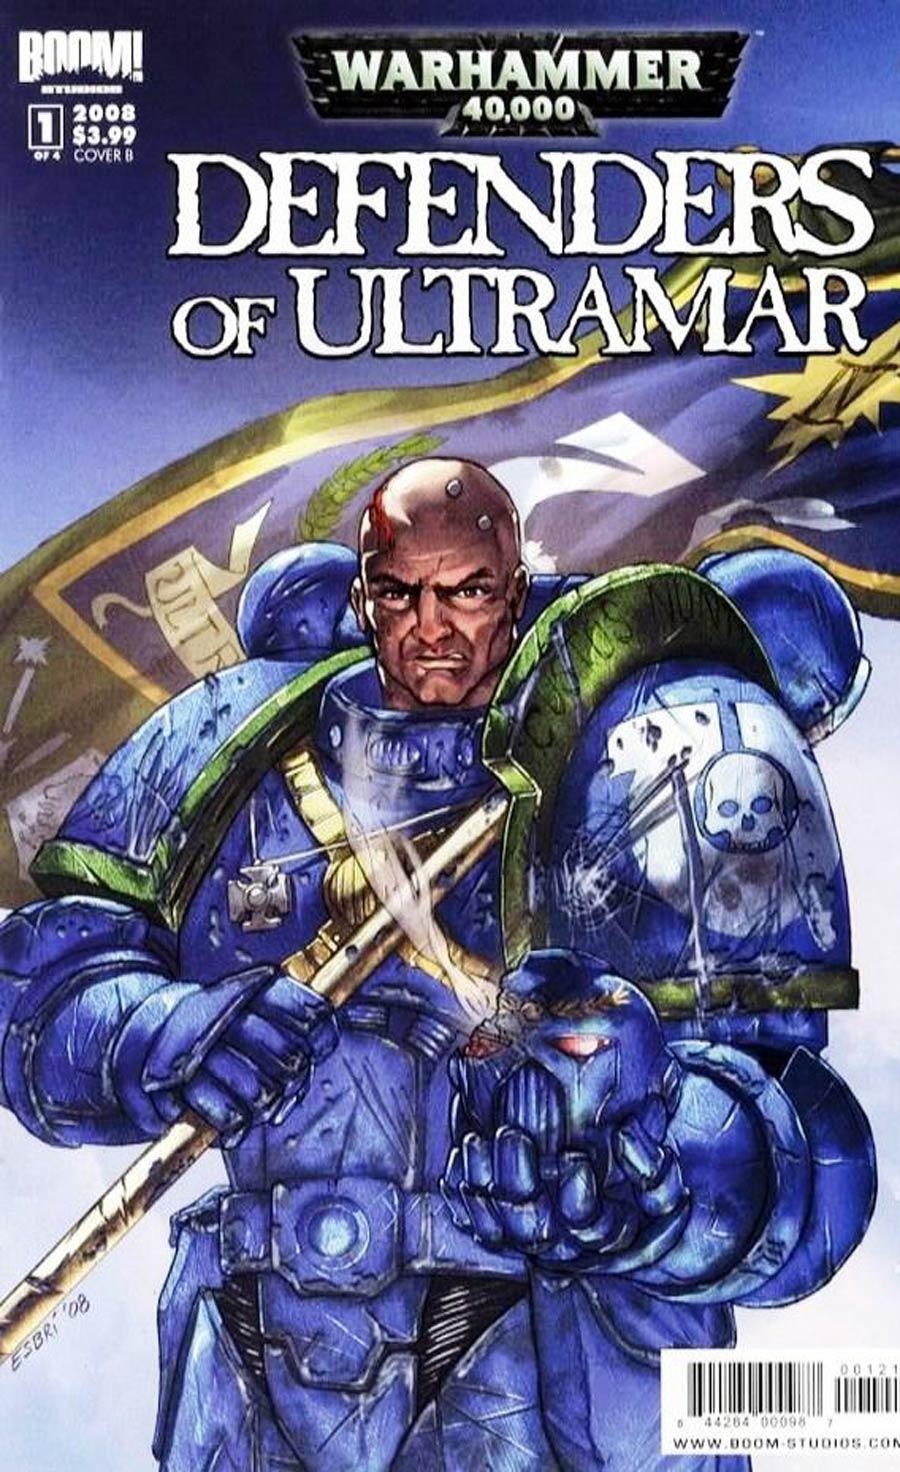 Warhammer 40K Defenders Of Ultramar #1 Cover B